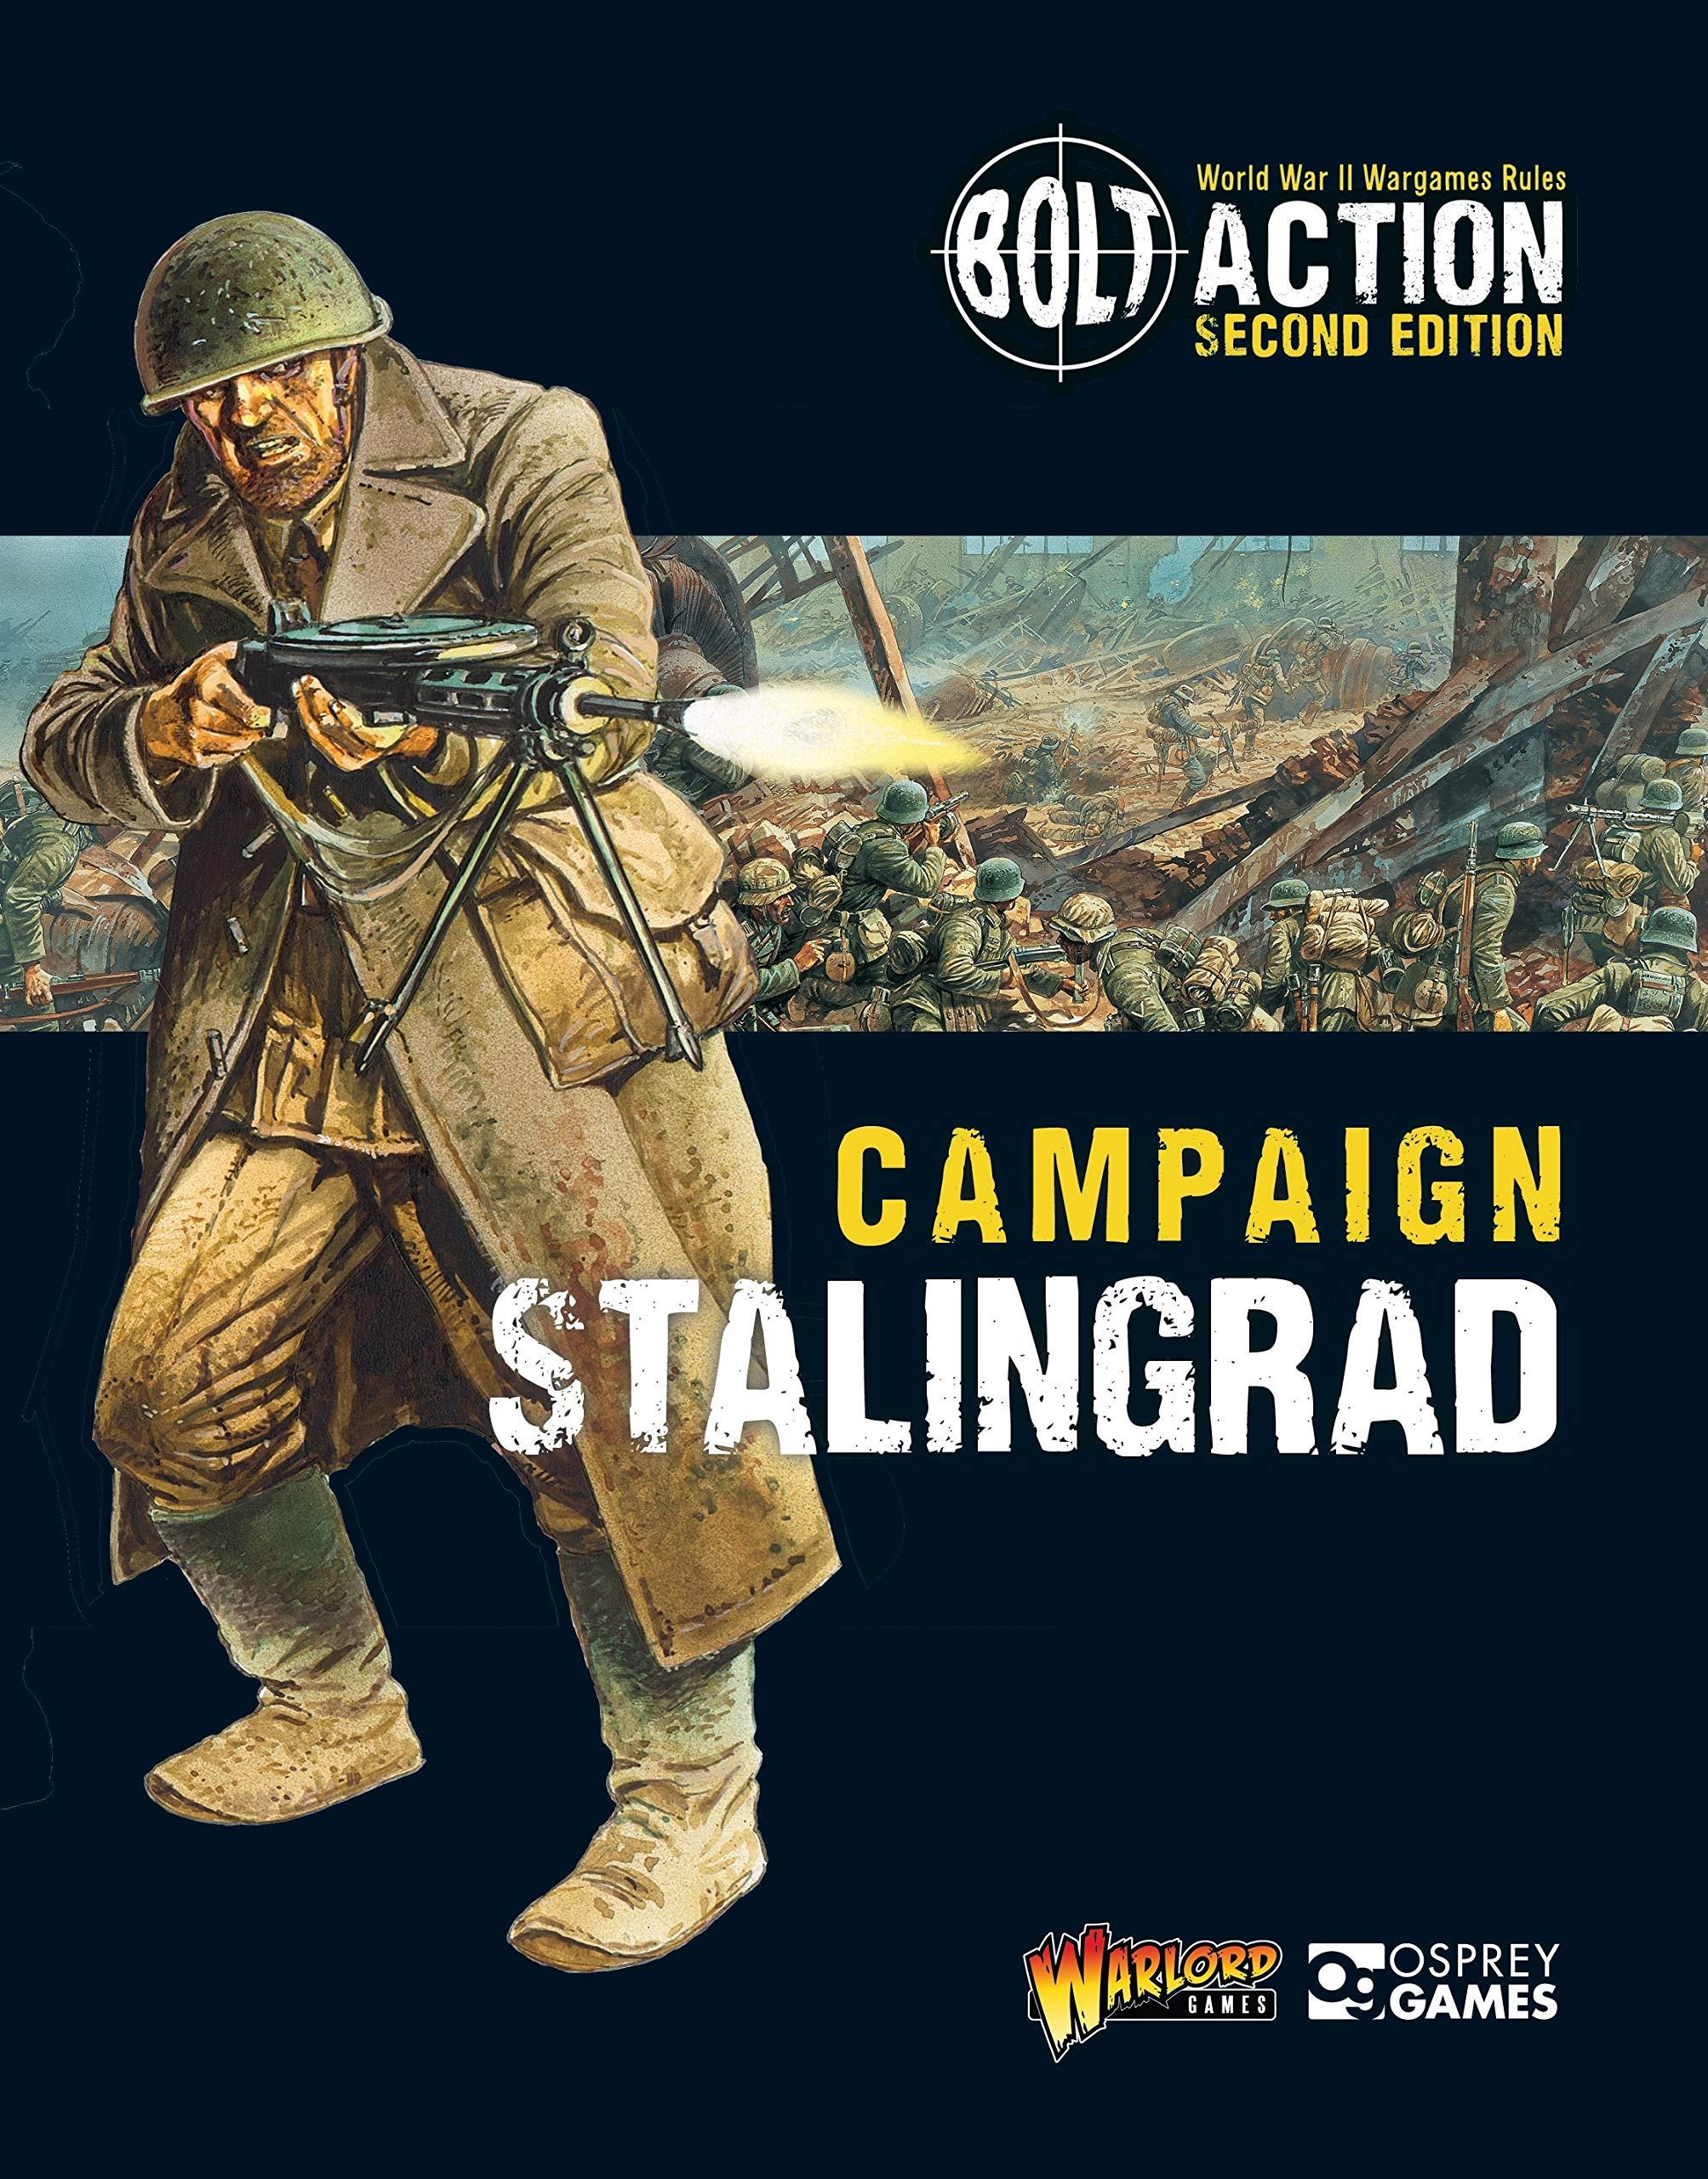 Day 1 Stalingrad